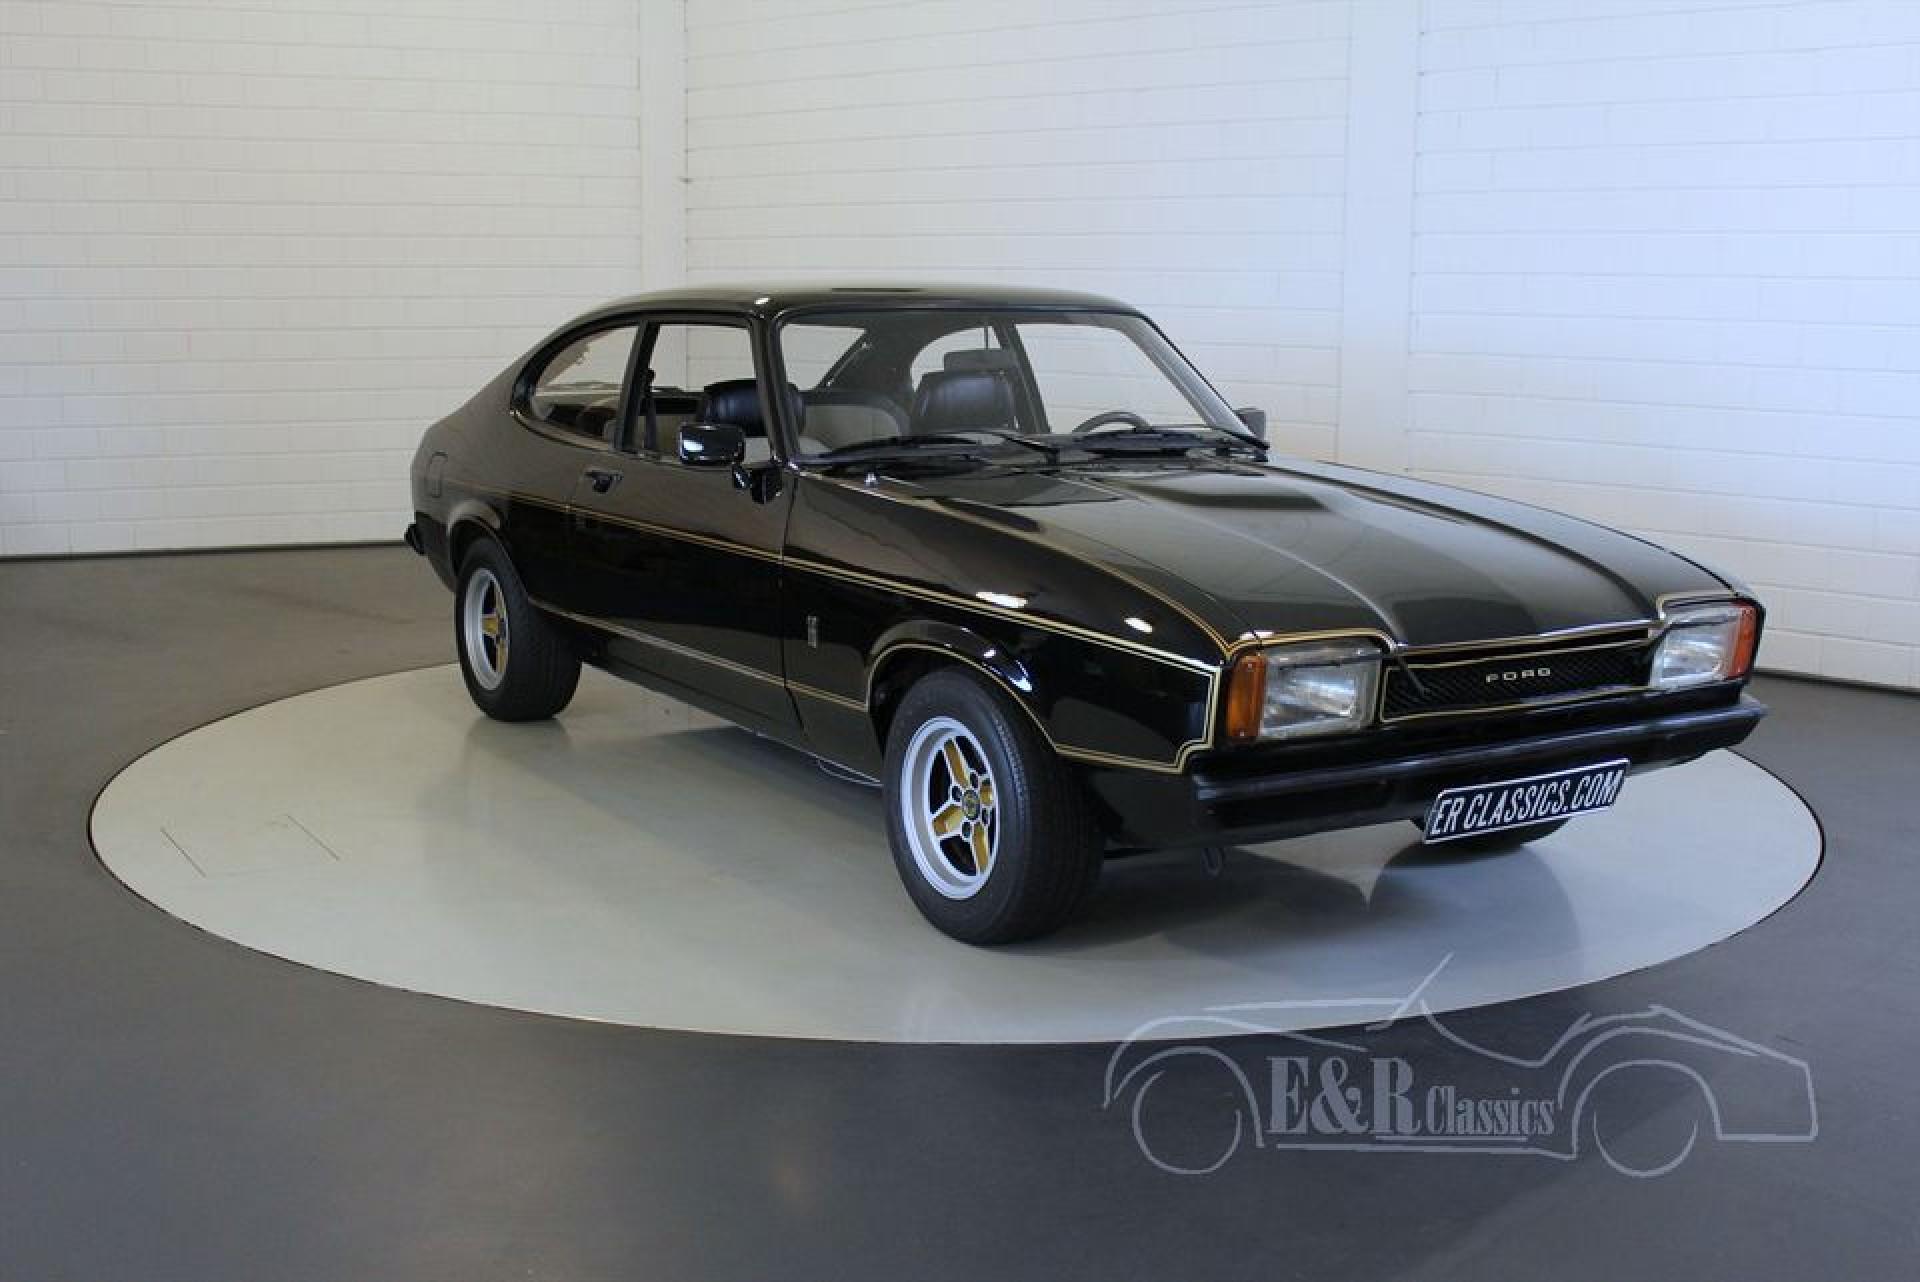 Austin Healey For Sale >> Ford Capri II JPS 1975 for sale at ERclassics